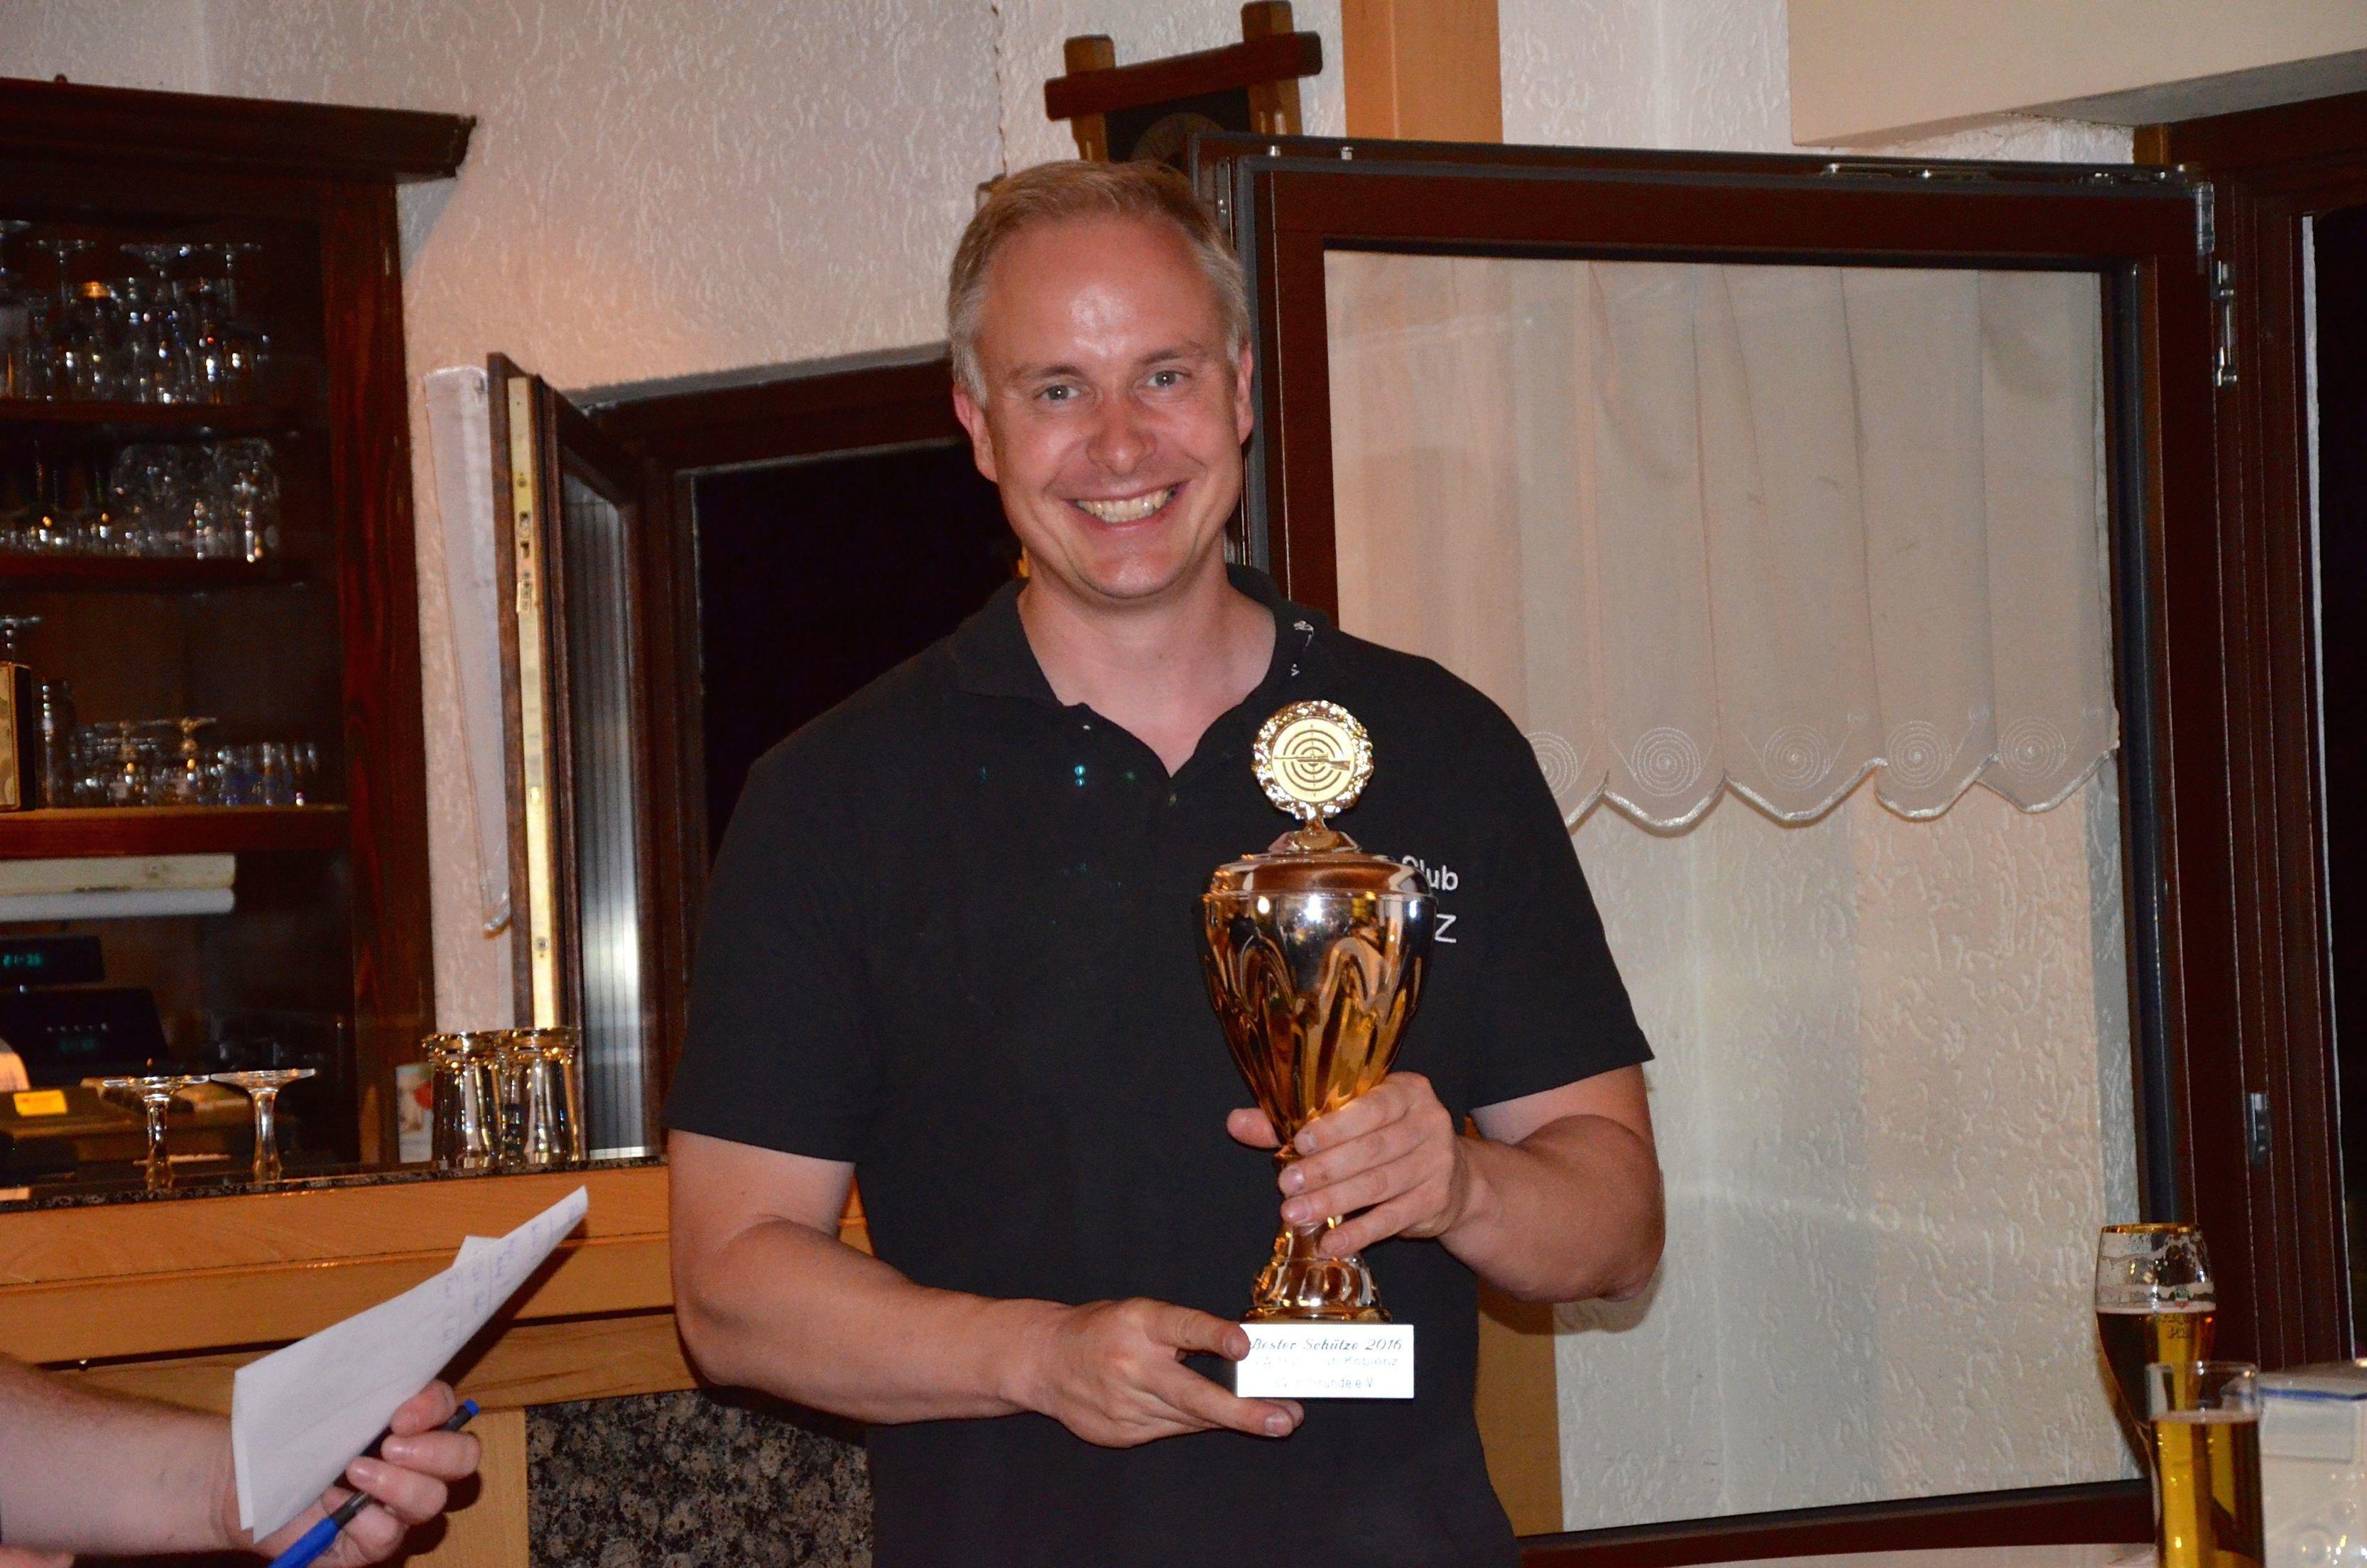 Clubabend VWBC Marenbach 2016 - 7